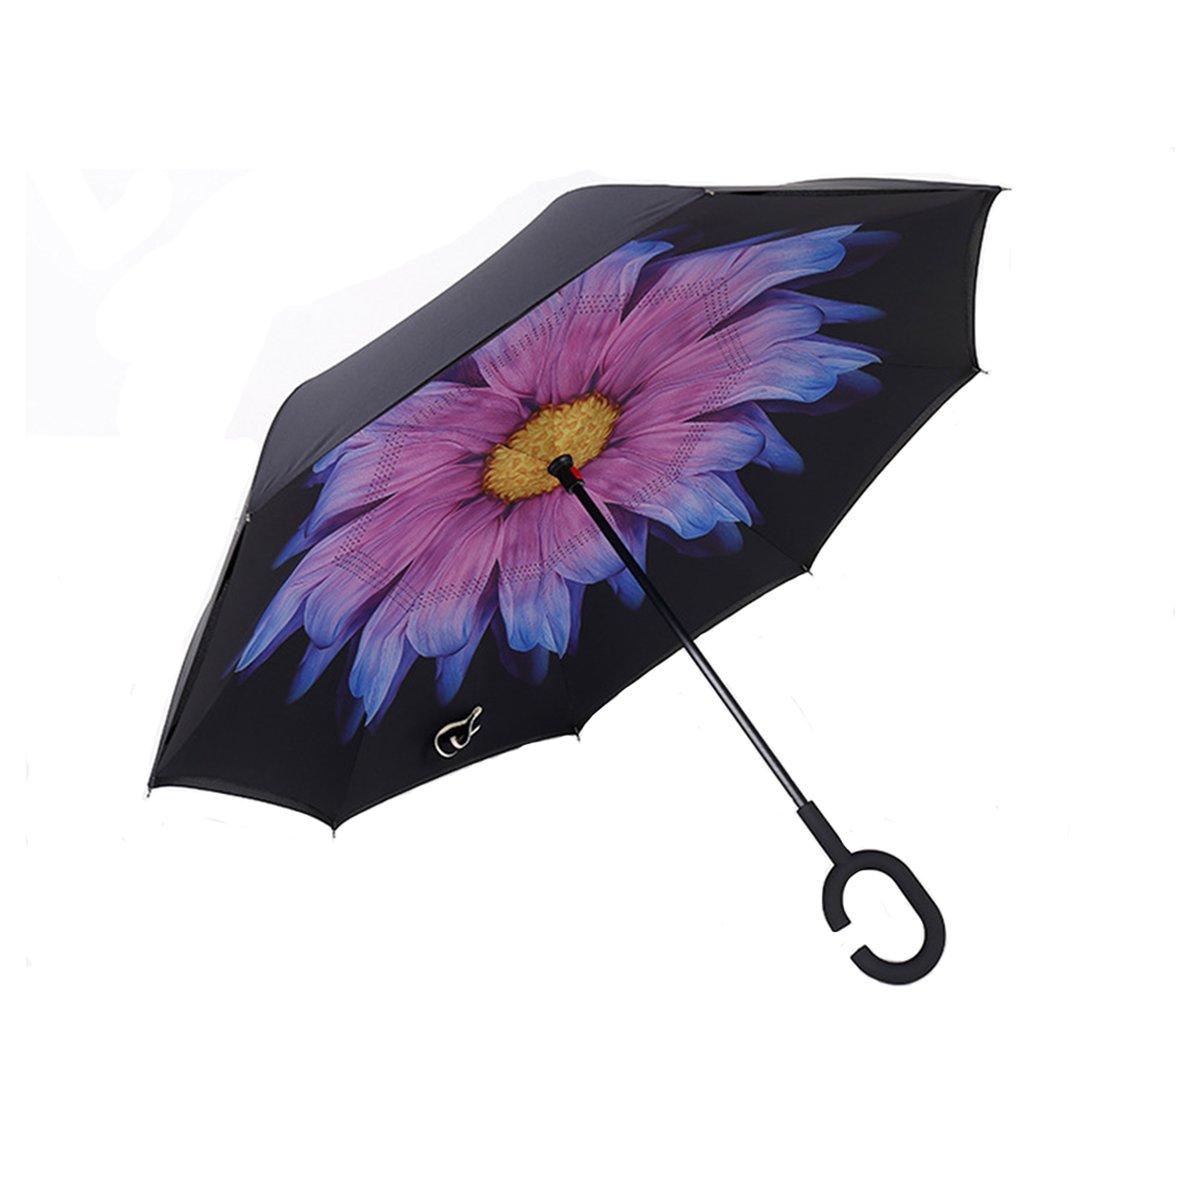 Glaze//Black Anti-UV Waterproof Umbrella Double Layer Inverted Umbrella with C-Shaped Handle